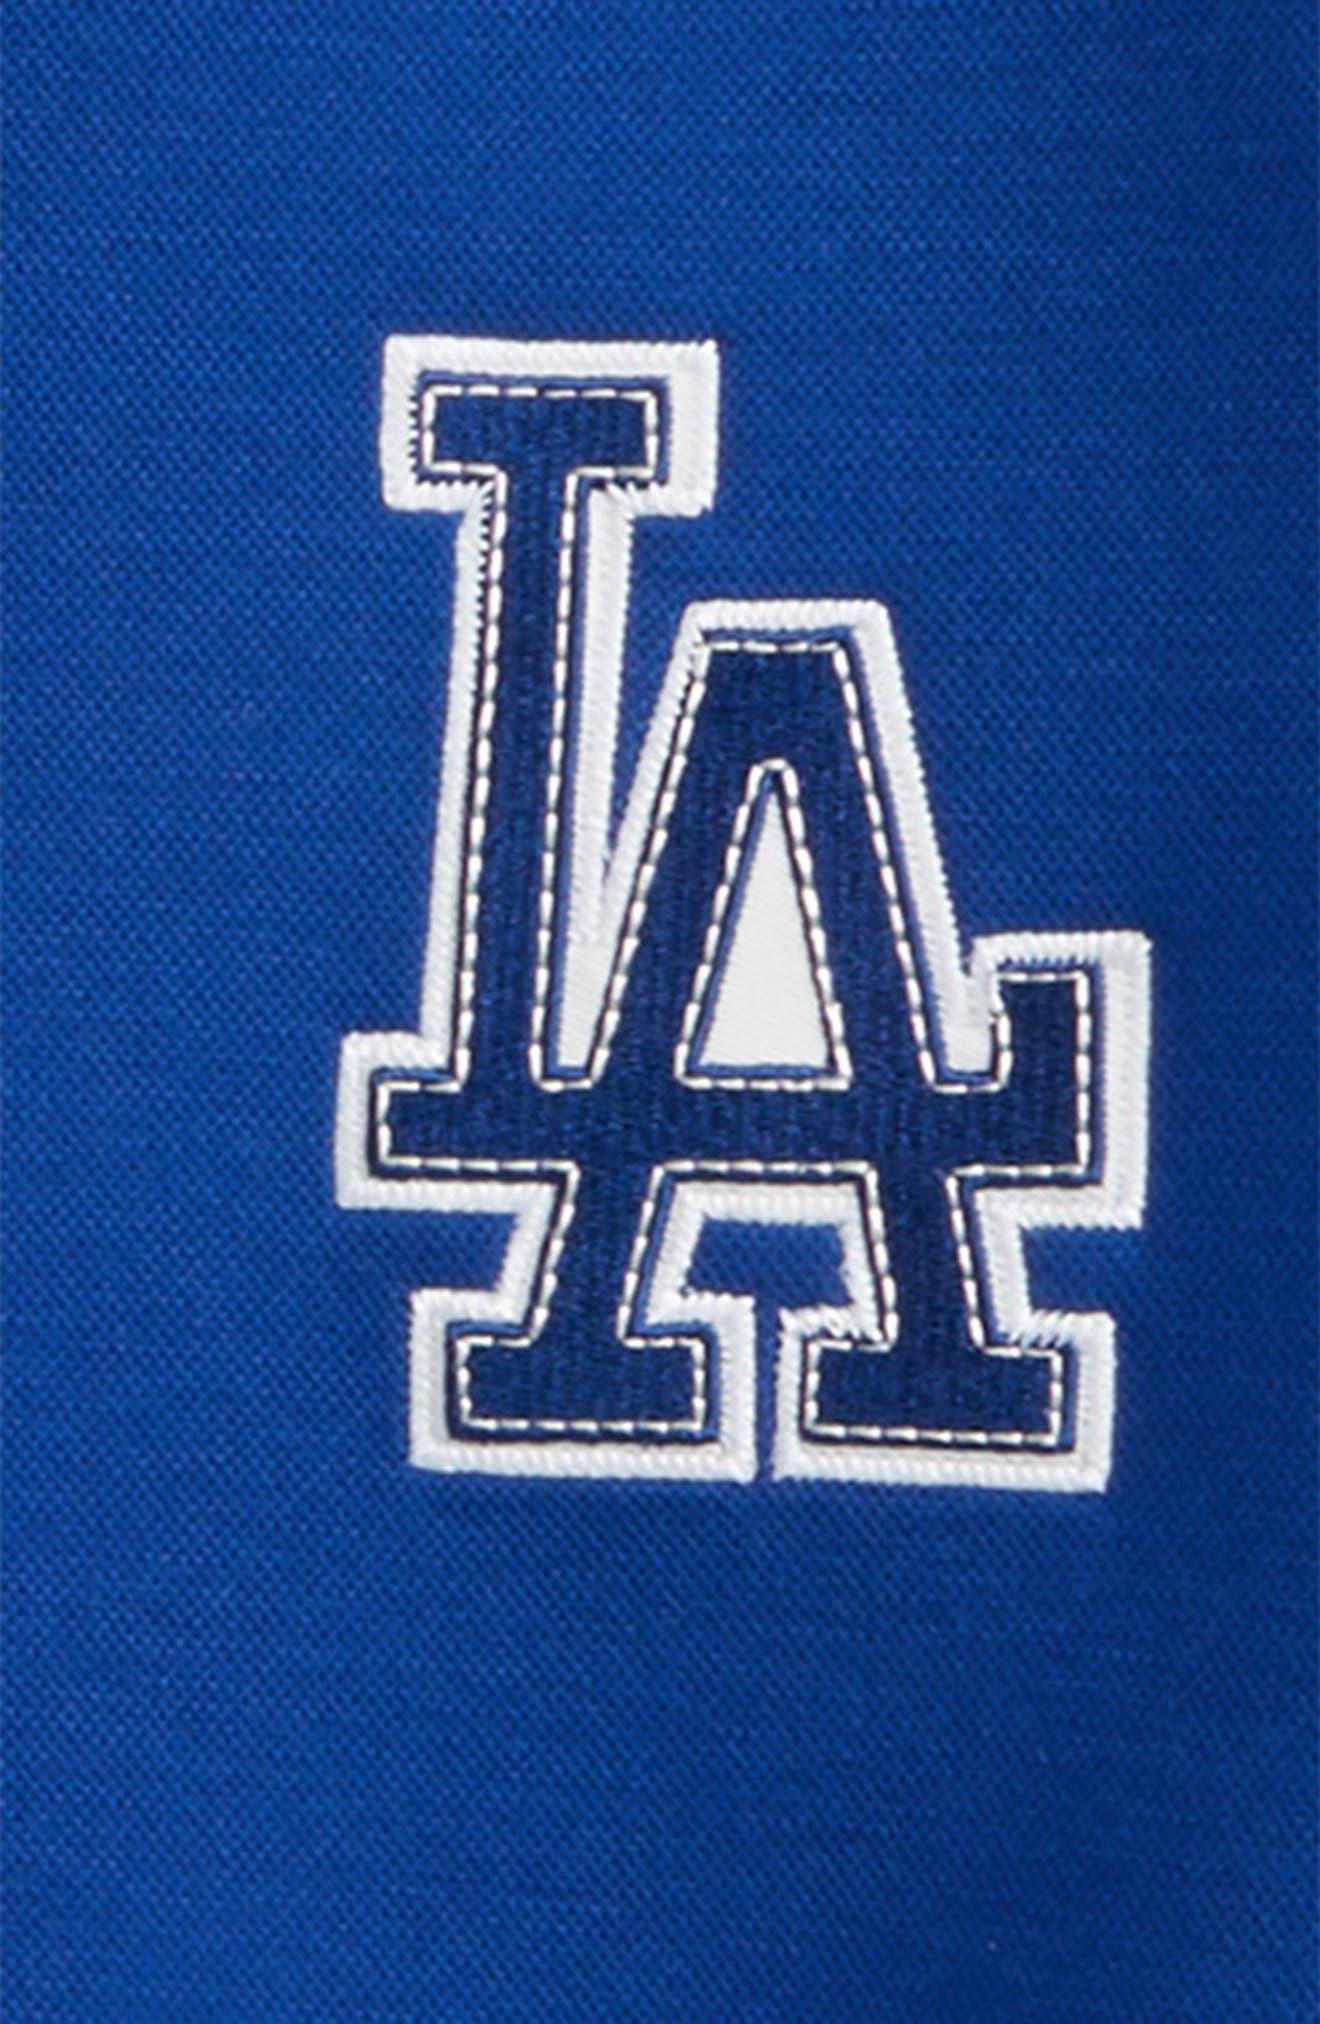 Classical Los Angeles Dodgers Knit Varsity Jacket,                             Alternate thumbnail 2, color,                             400